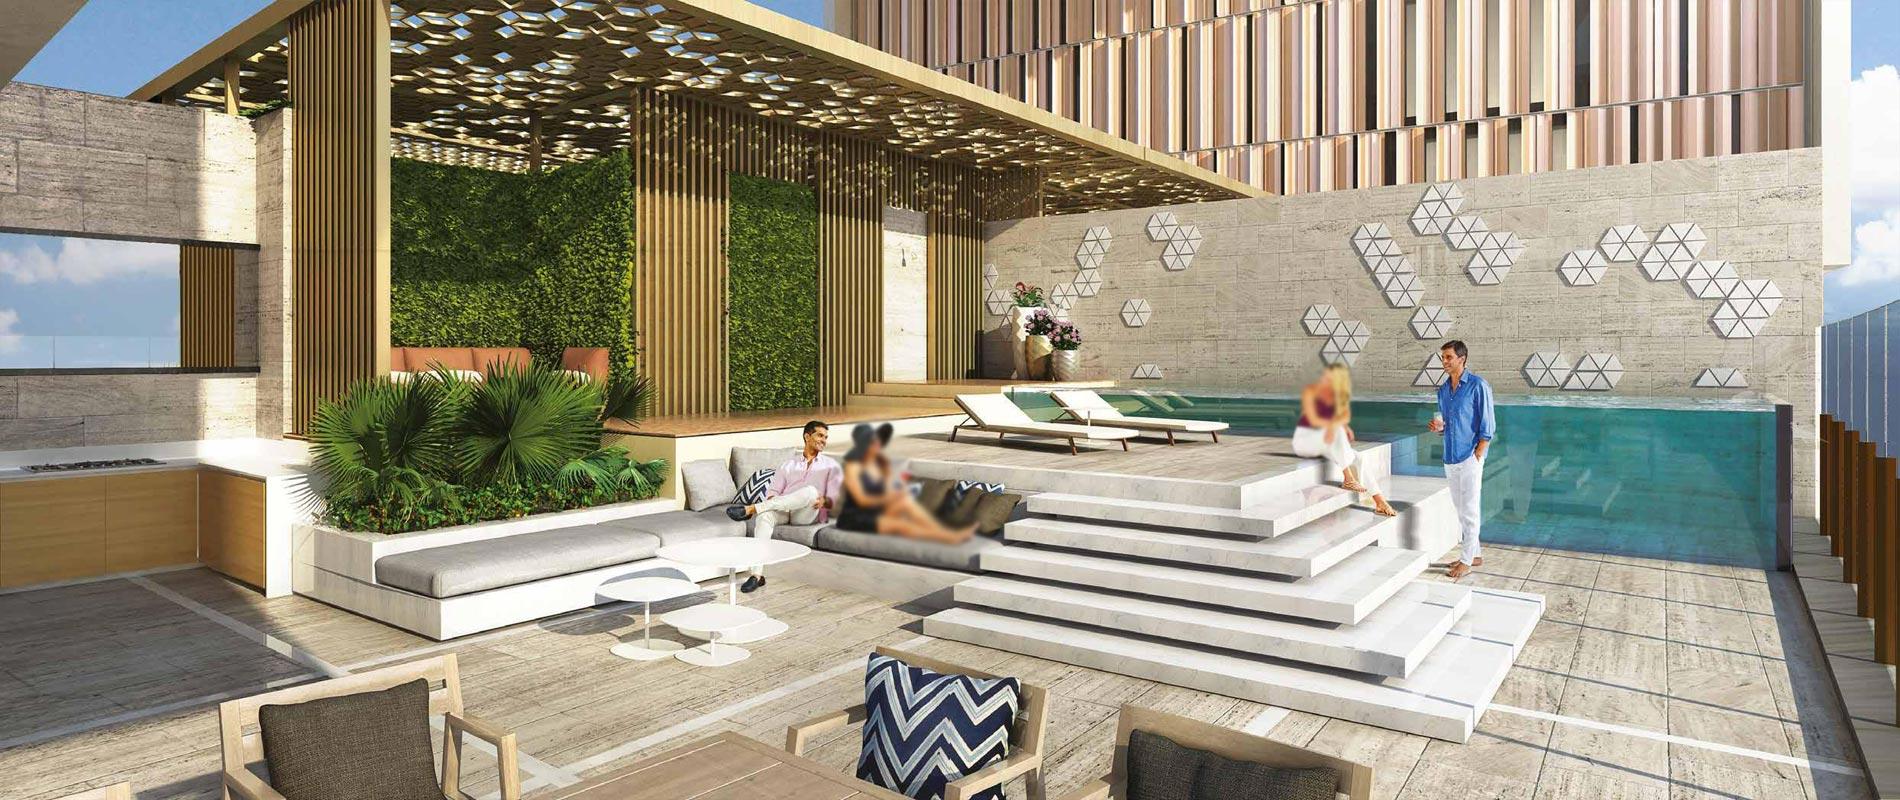 ROYAL ATLANTIS RESORT & RESIDENCES, Palm Jumeirah, Dubai, EAU – foto 6